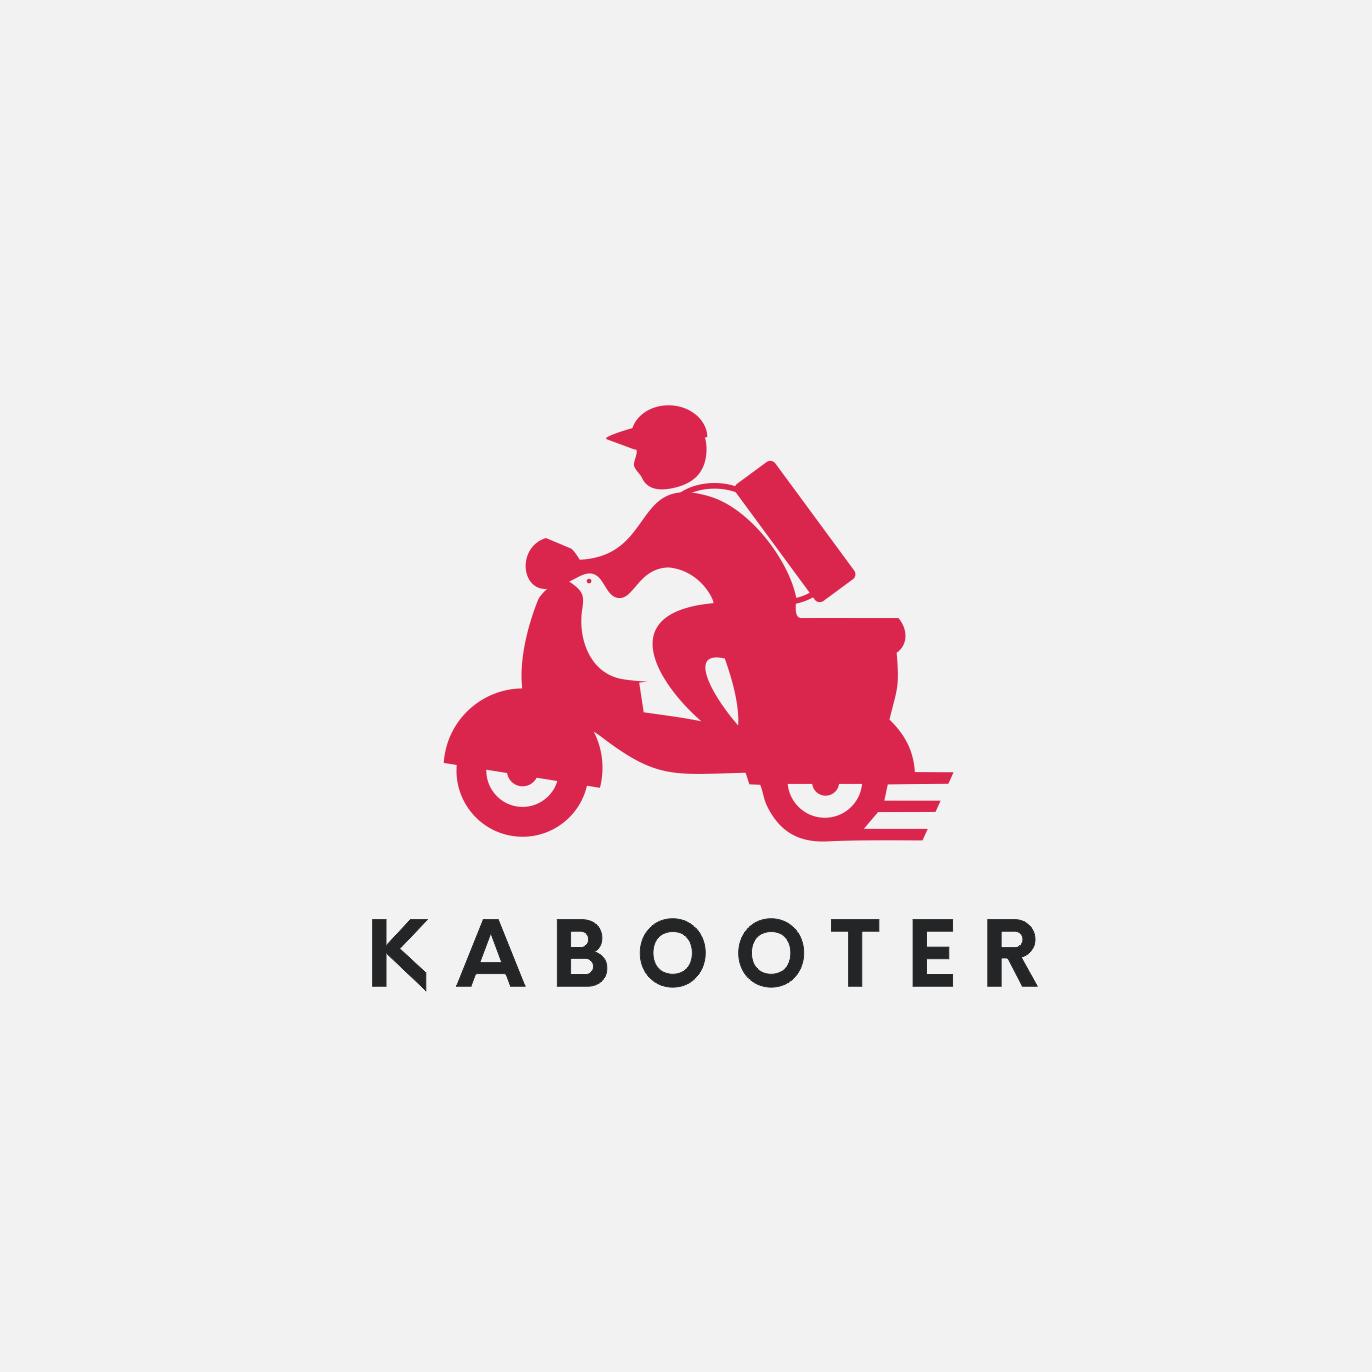 Kabooter logo